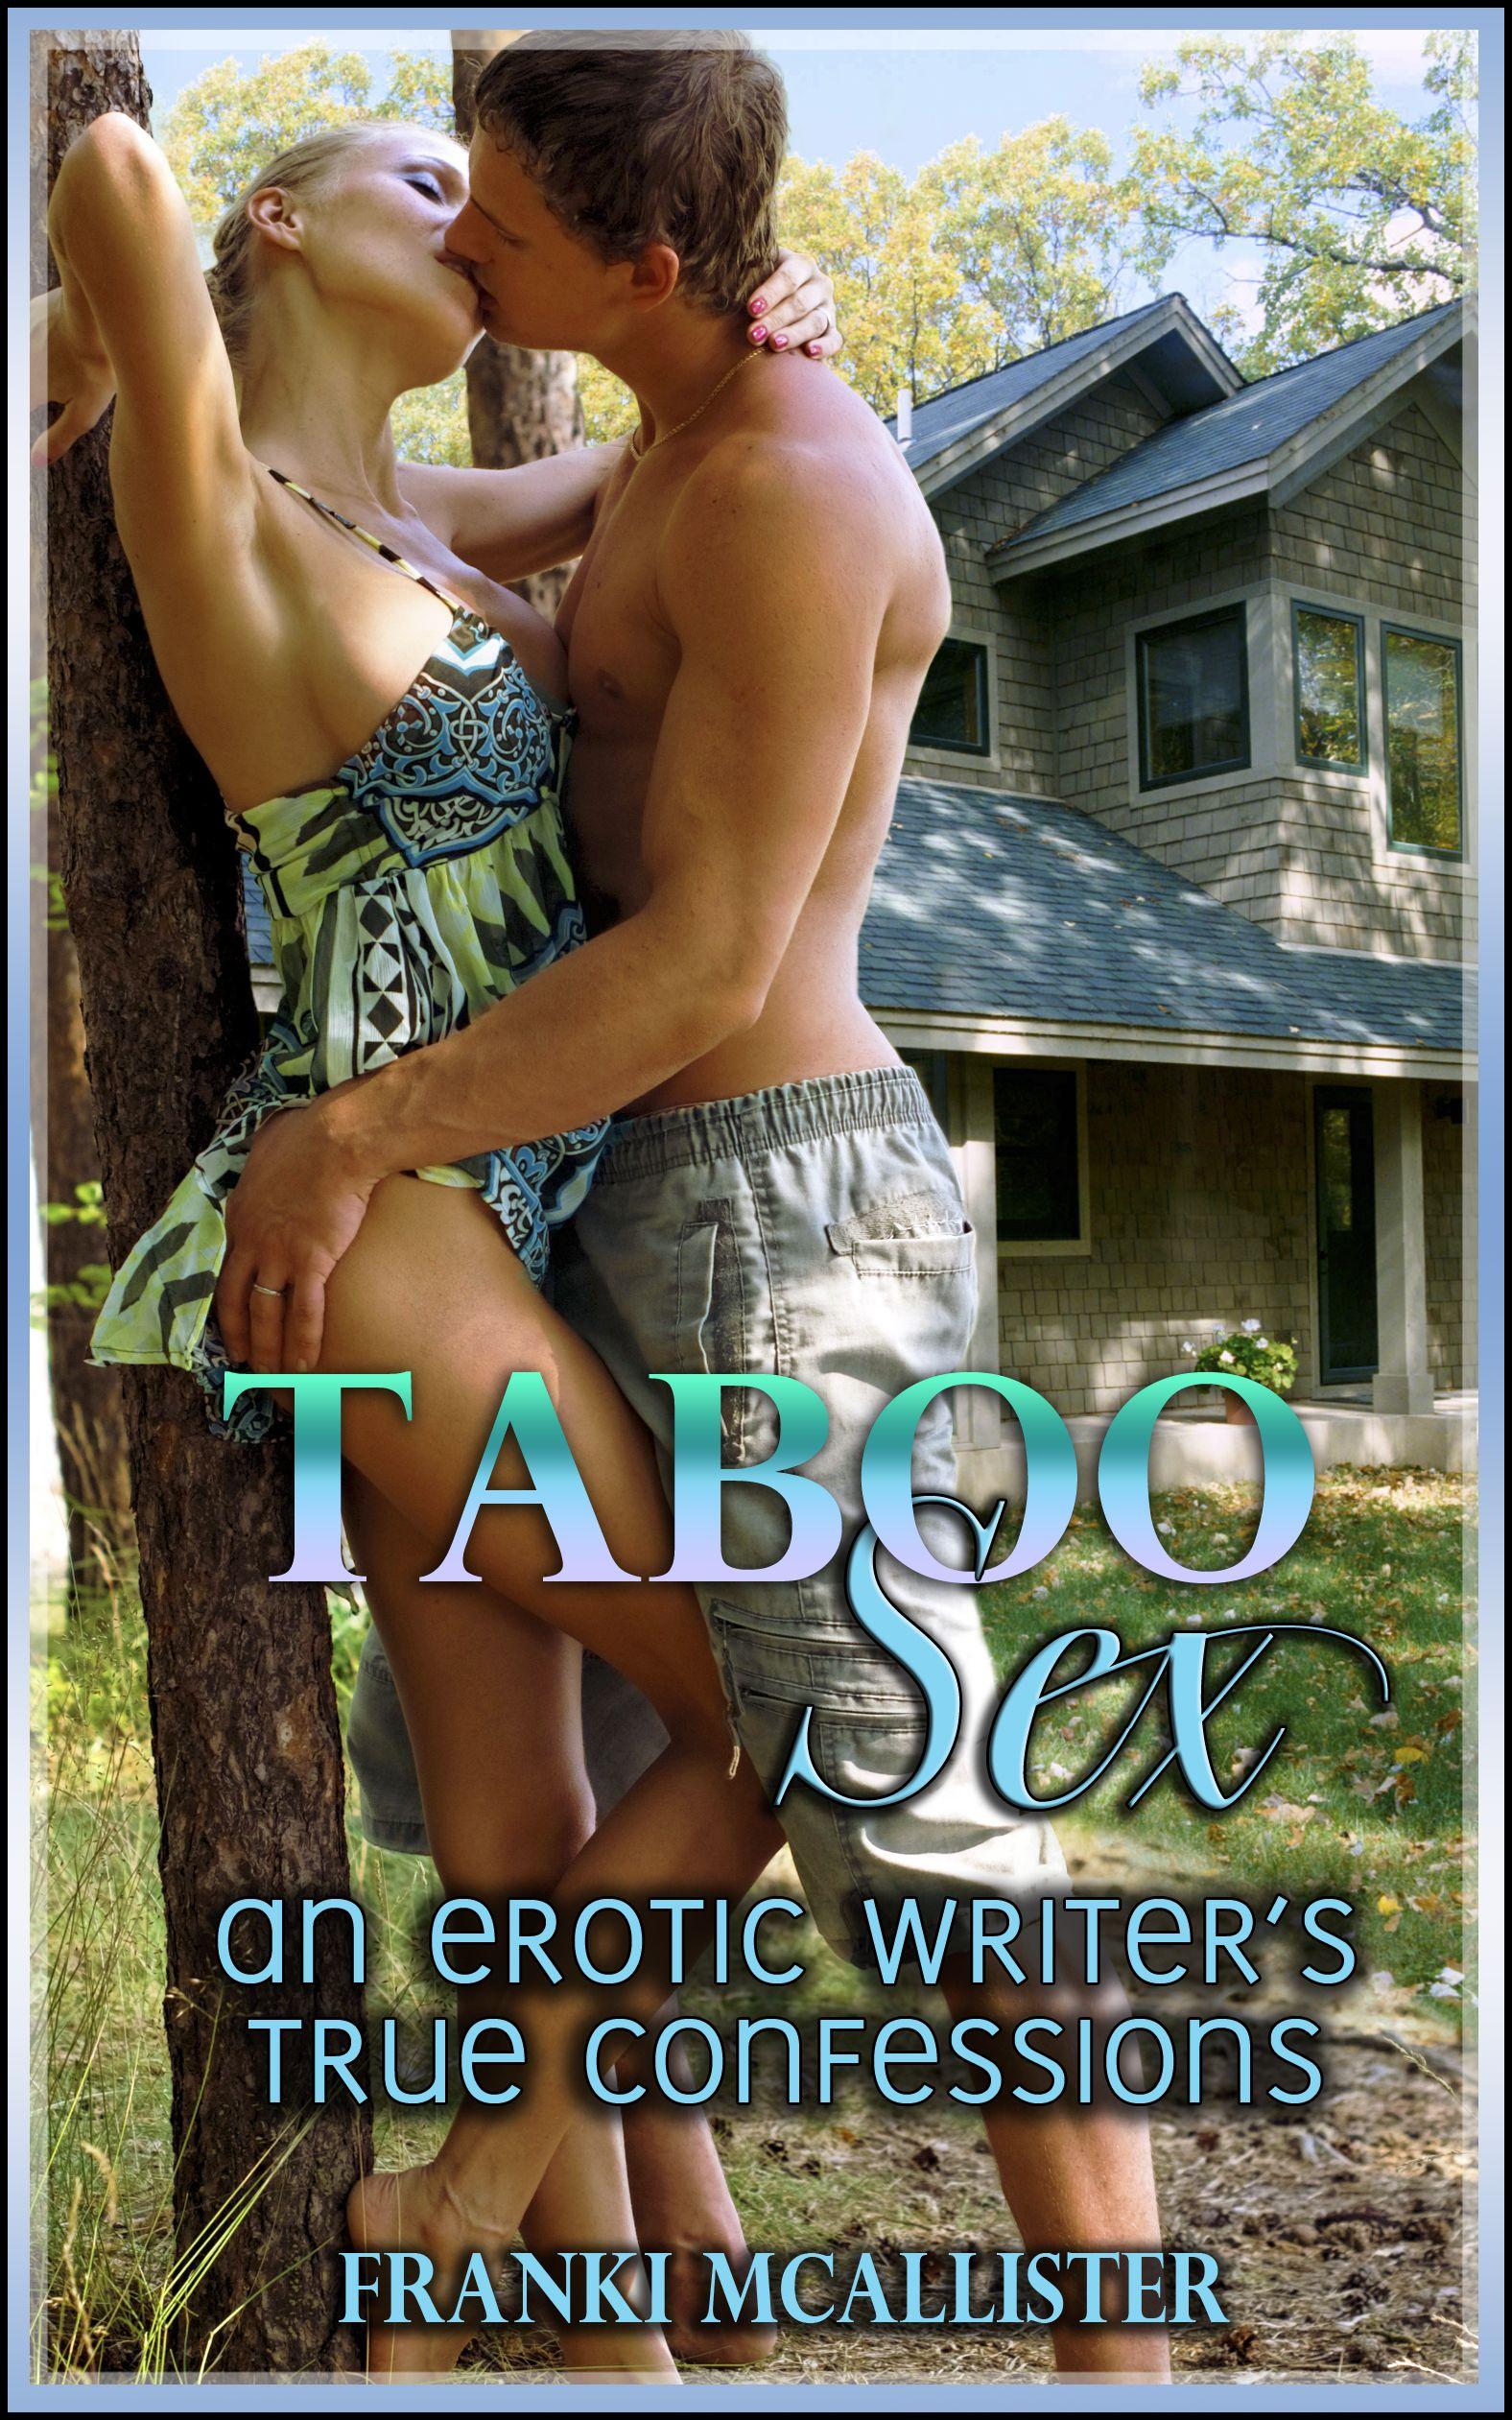 True taboo sex stories